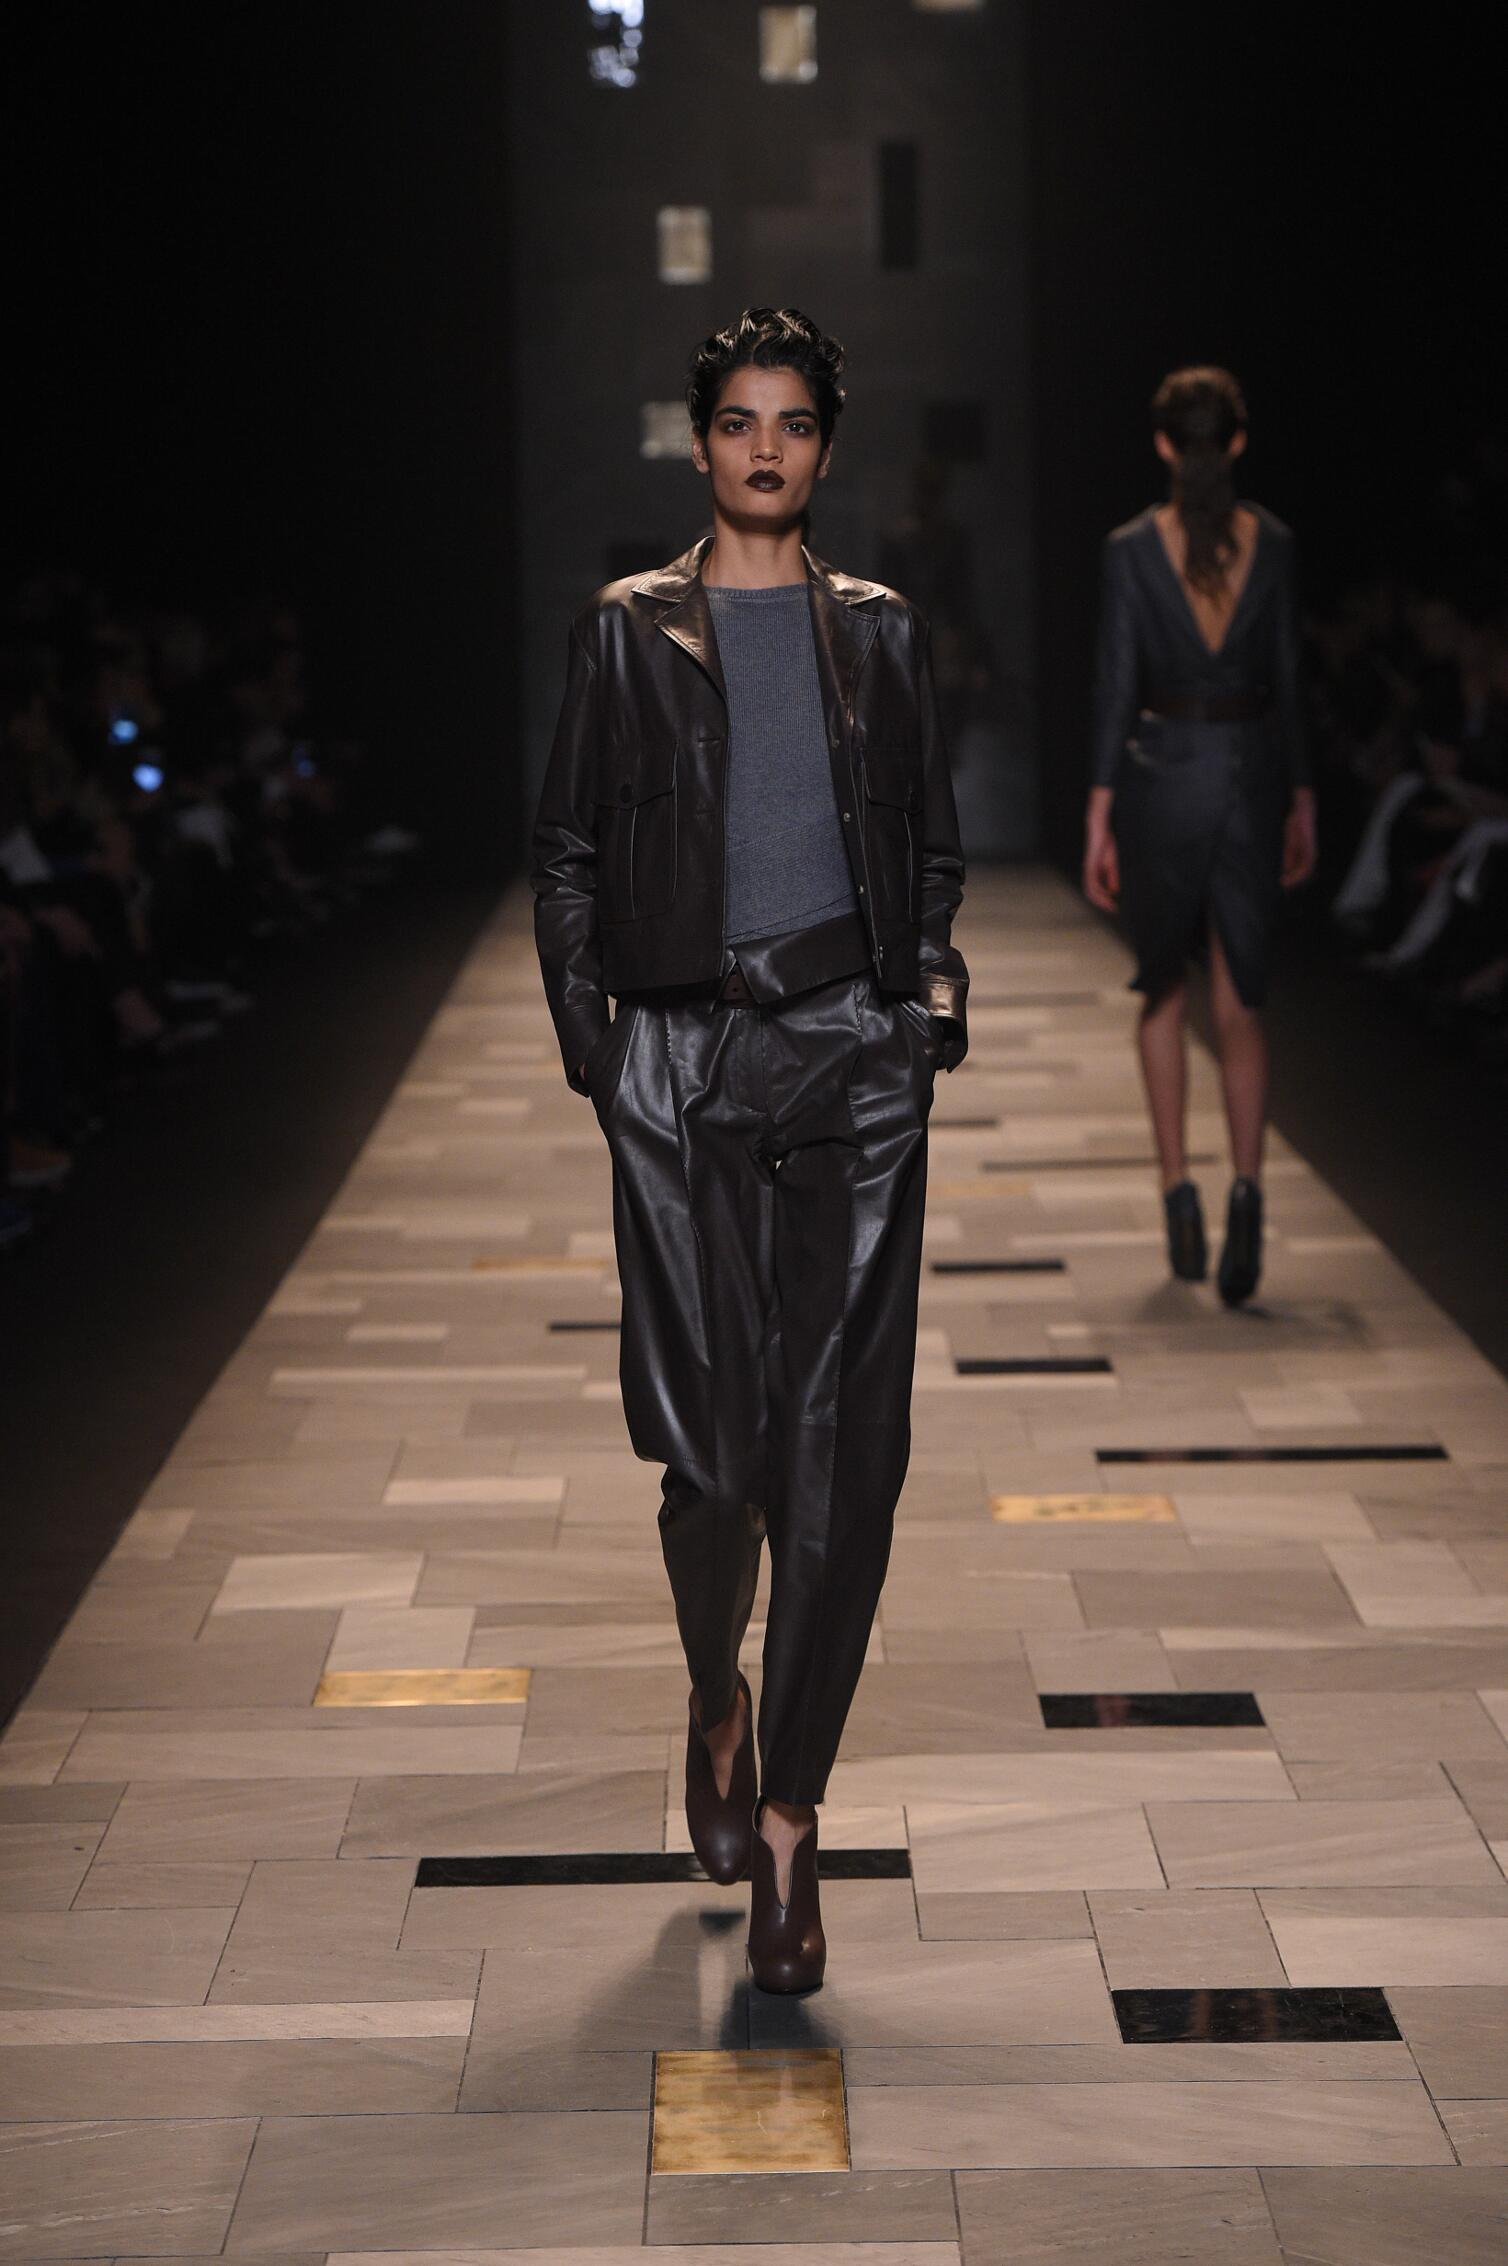 2016 Fall Fashion Woman Trussardi Collection